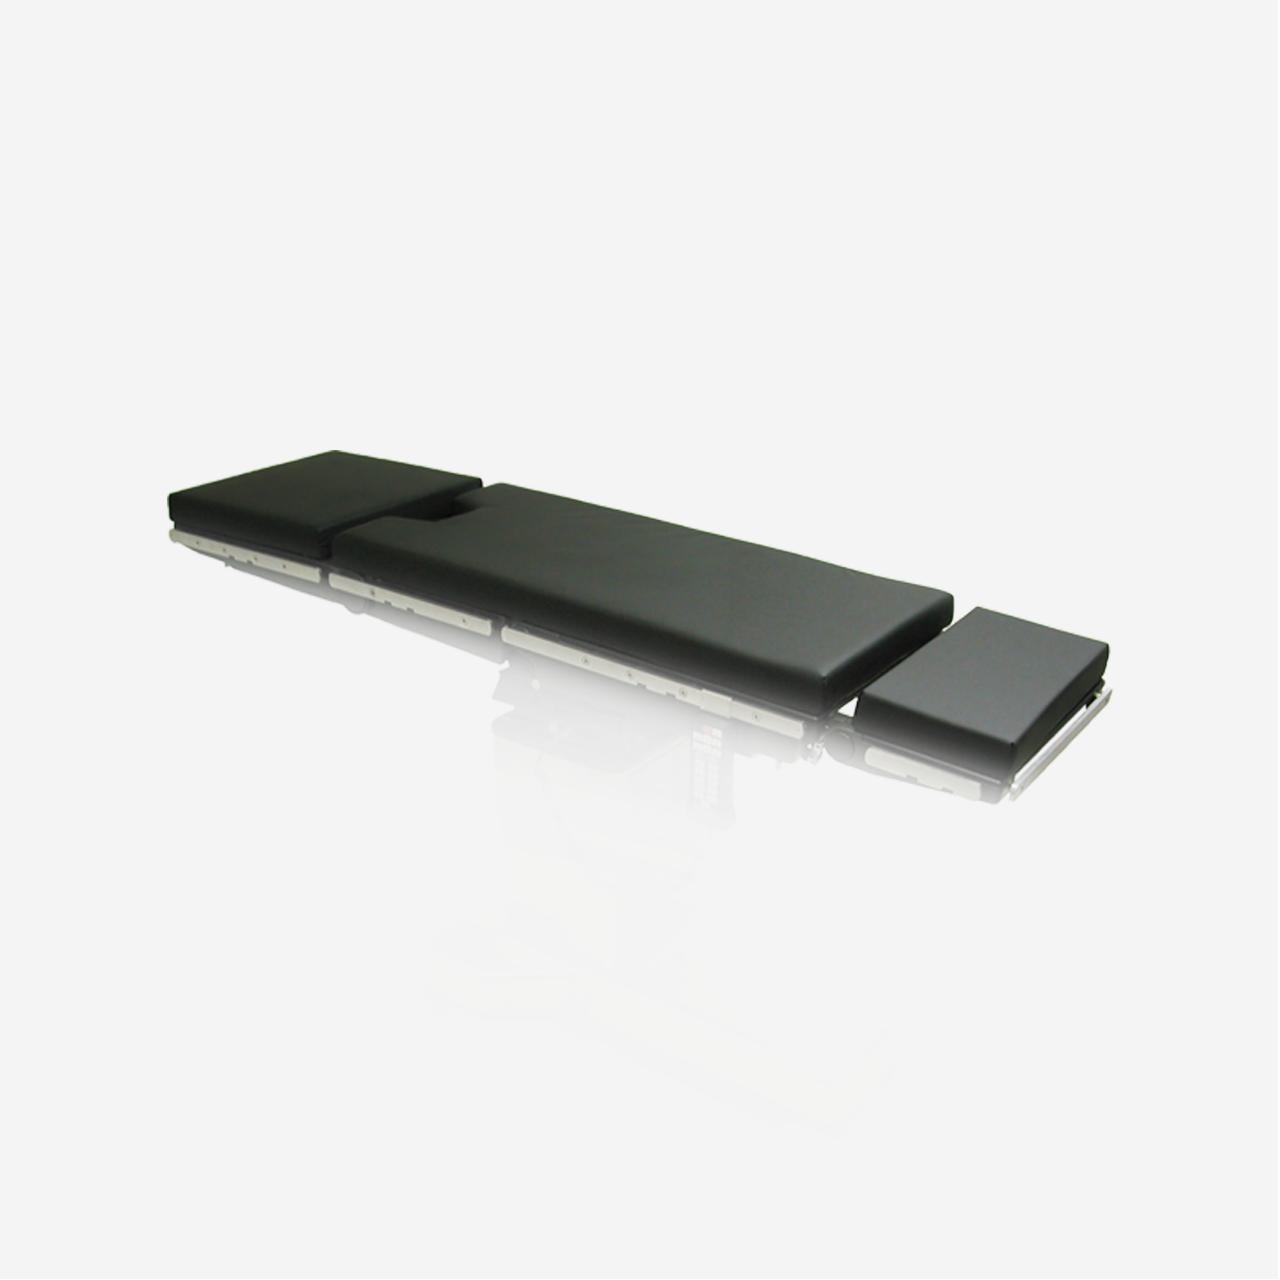 Amsco 3080/3085 Cushion Set - BCS- 3320